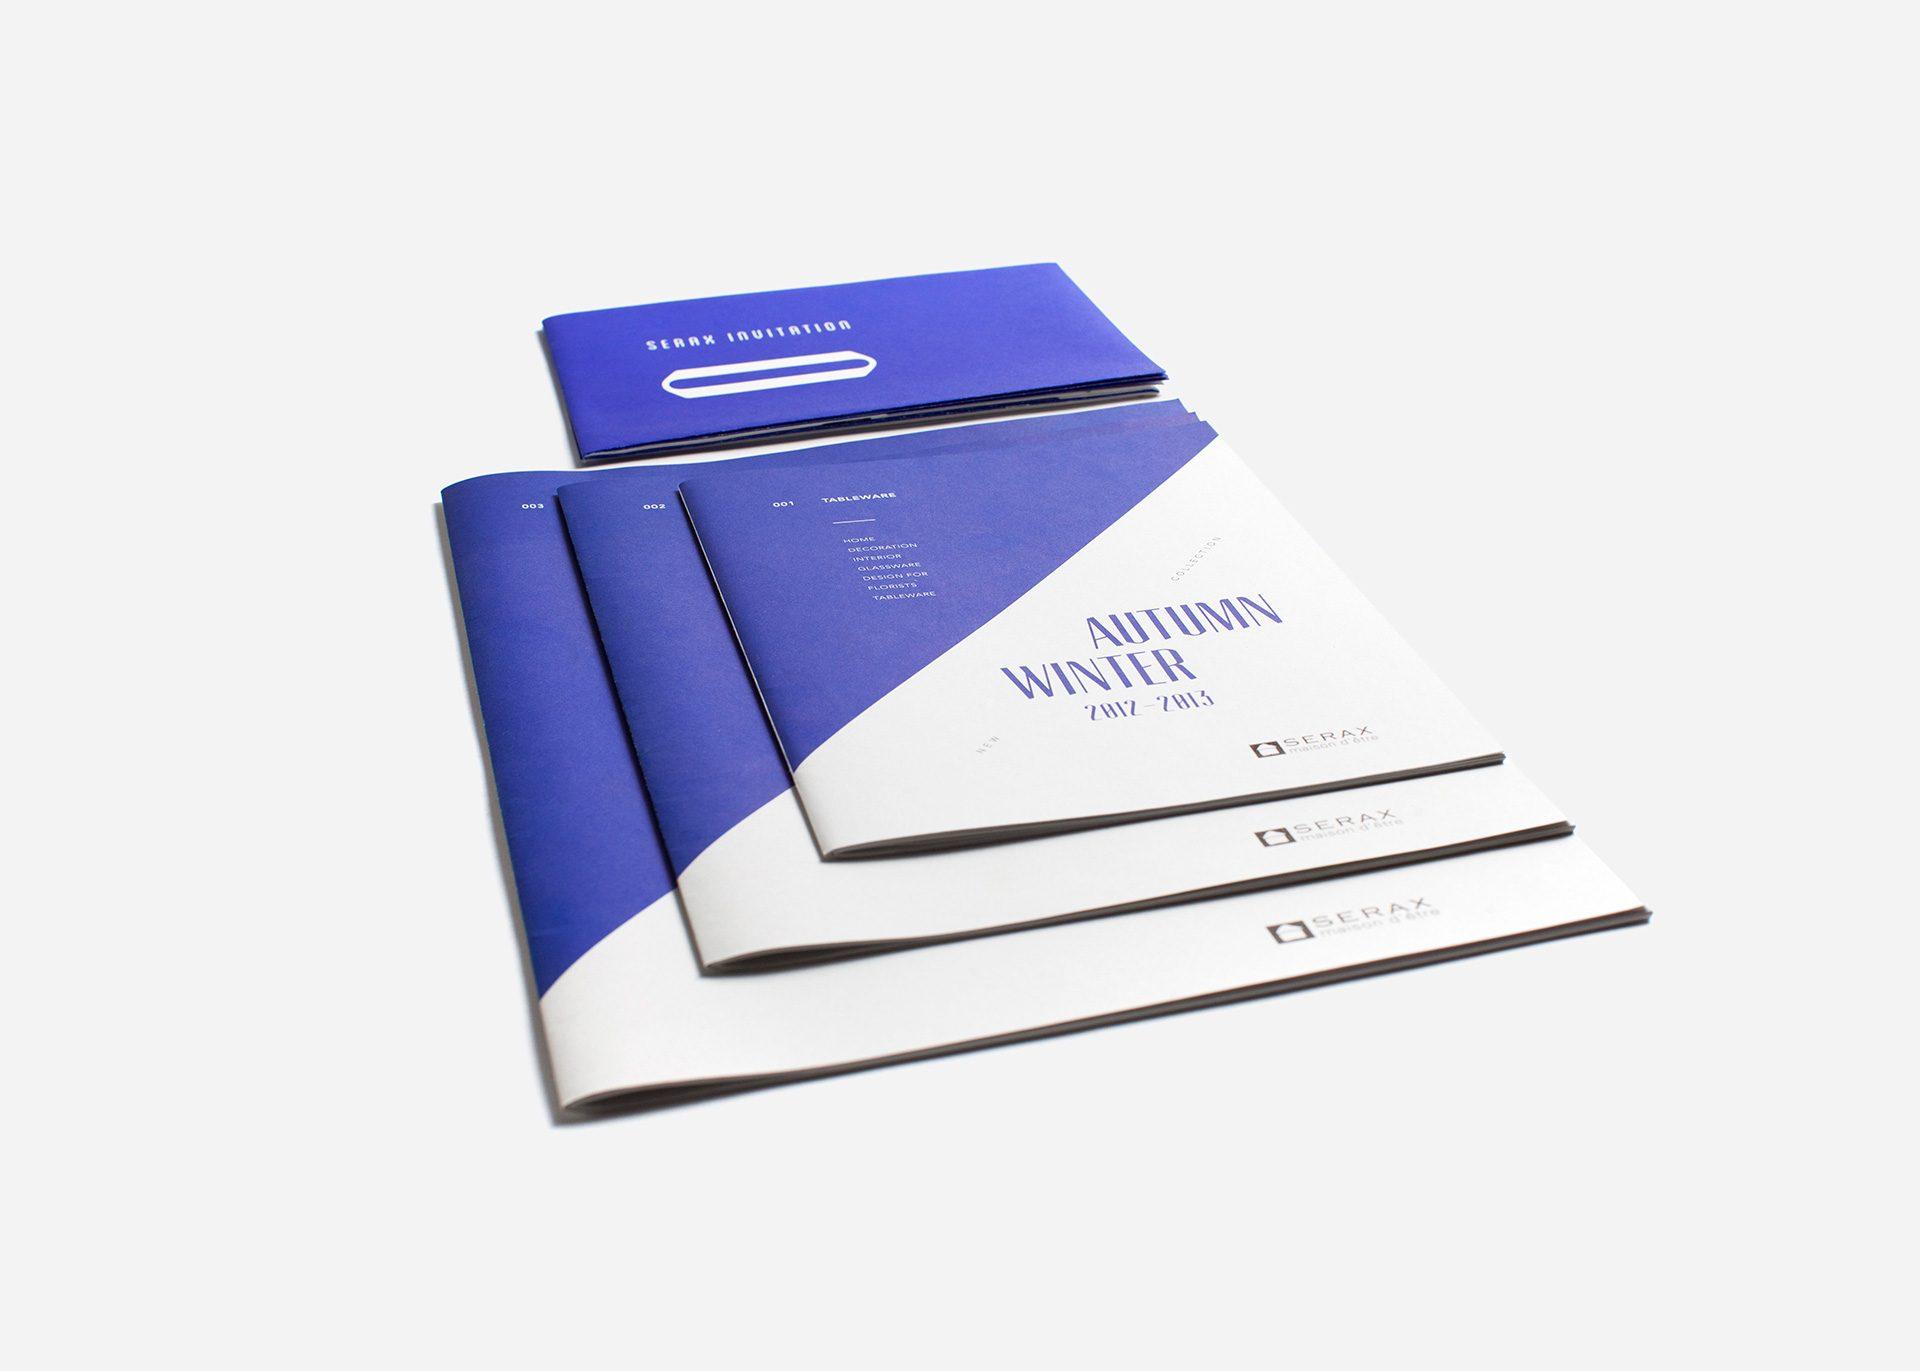 SERAX catalogue and opendays invitation